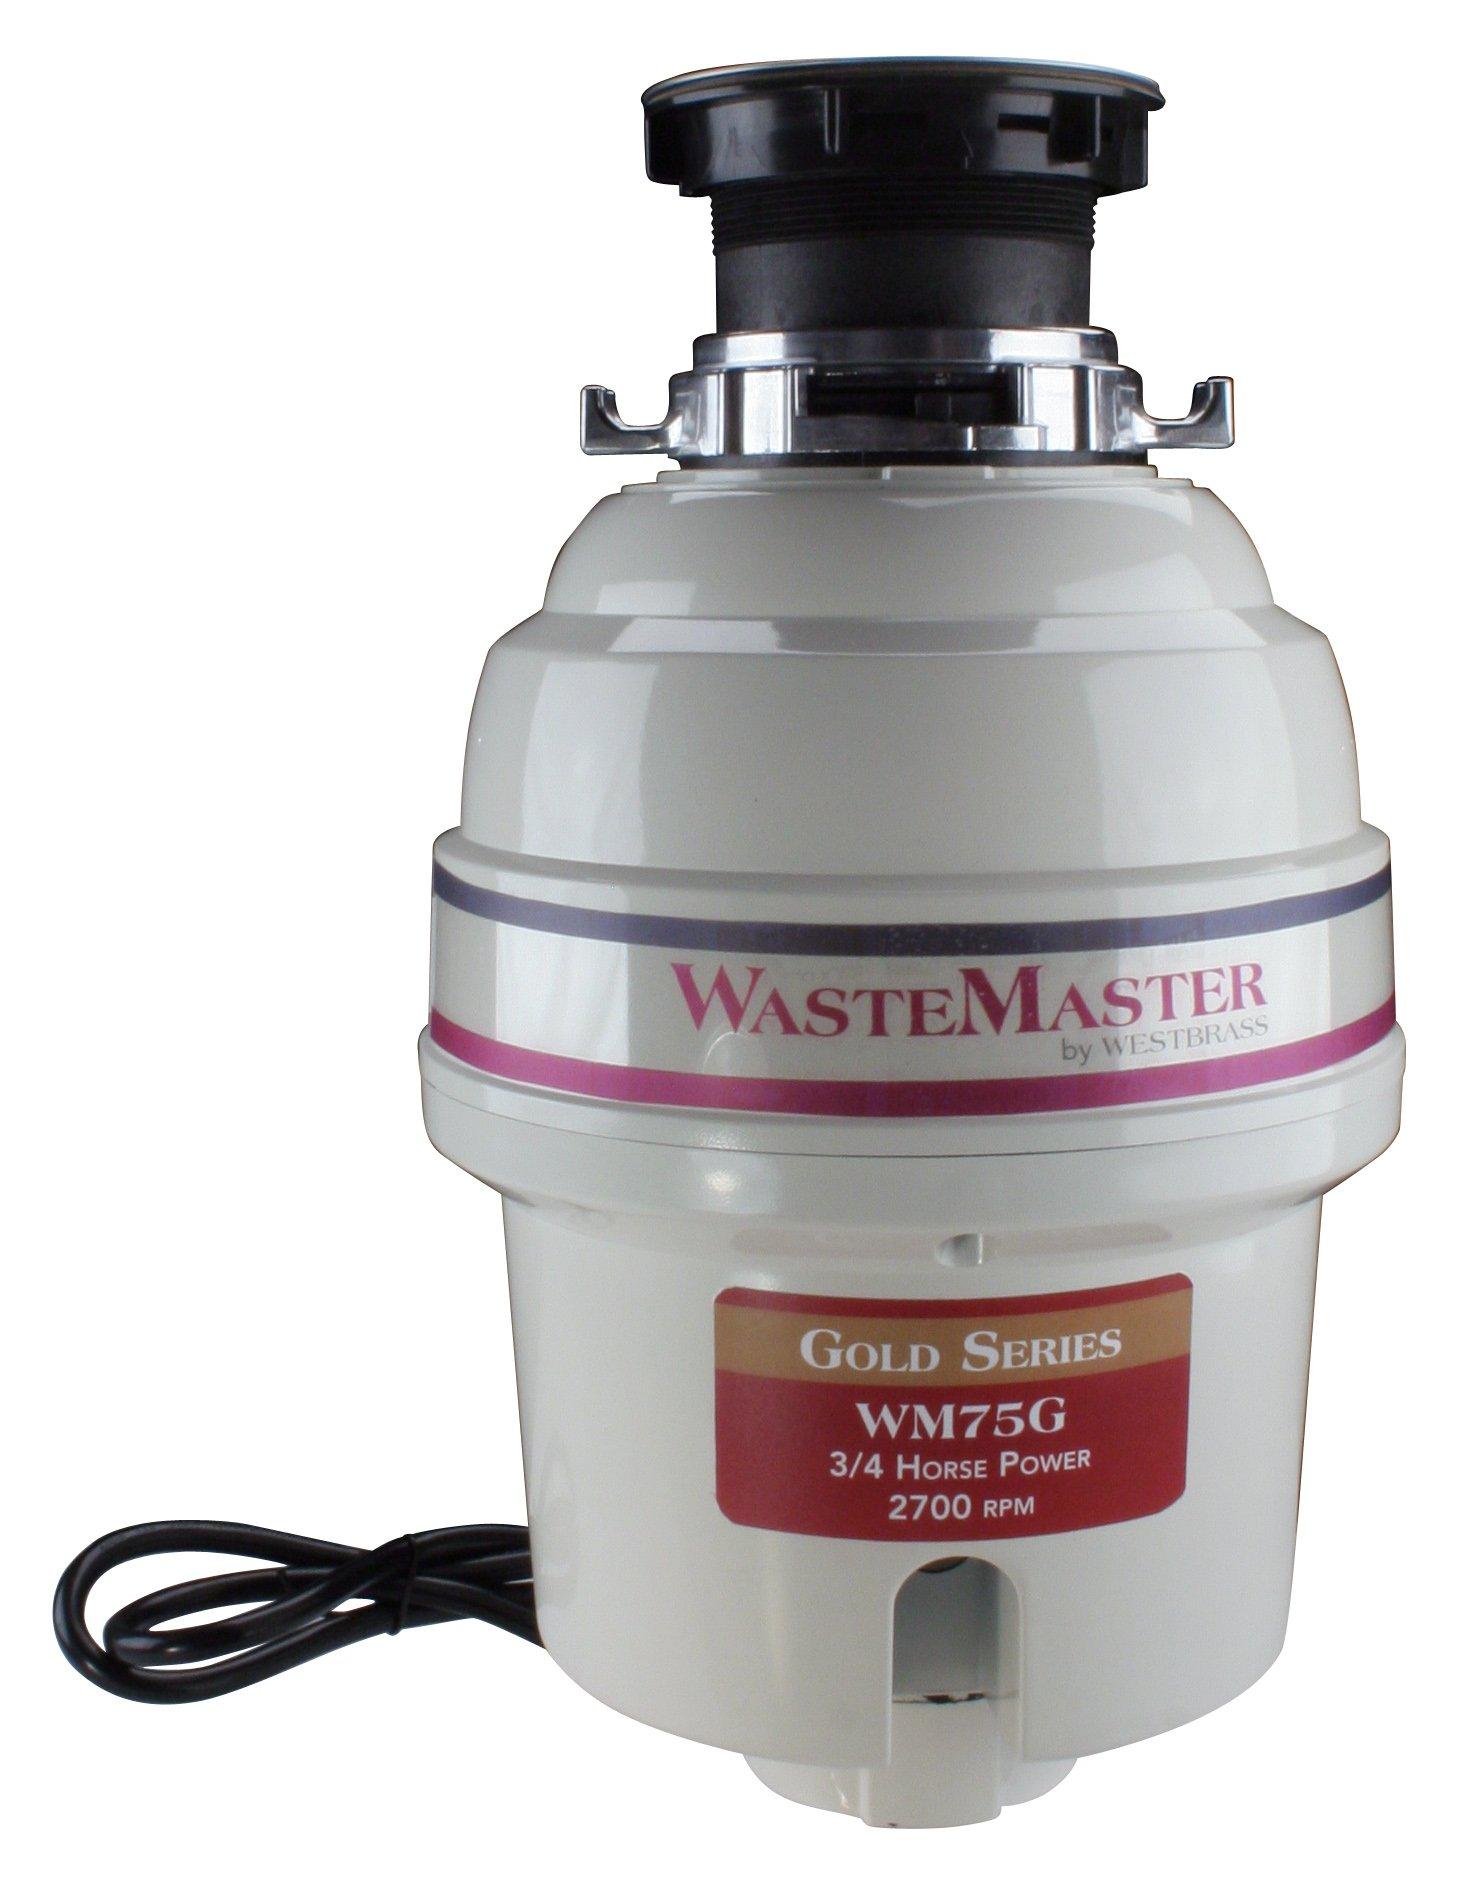 Westbrass WM75G .75 HP Food Waste Disposal by Westbrass